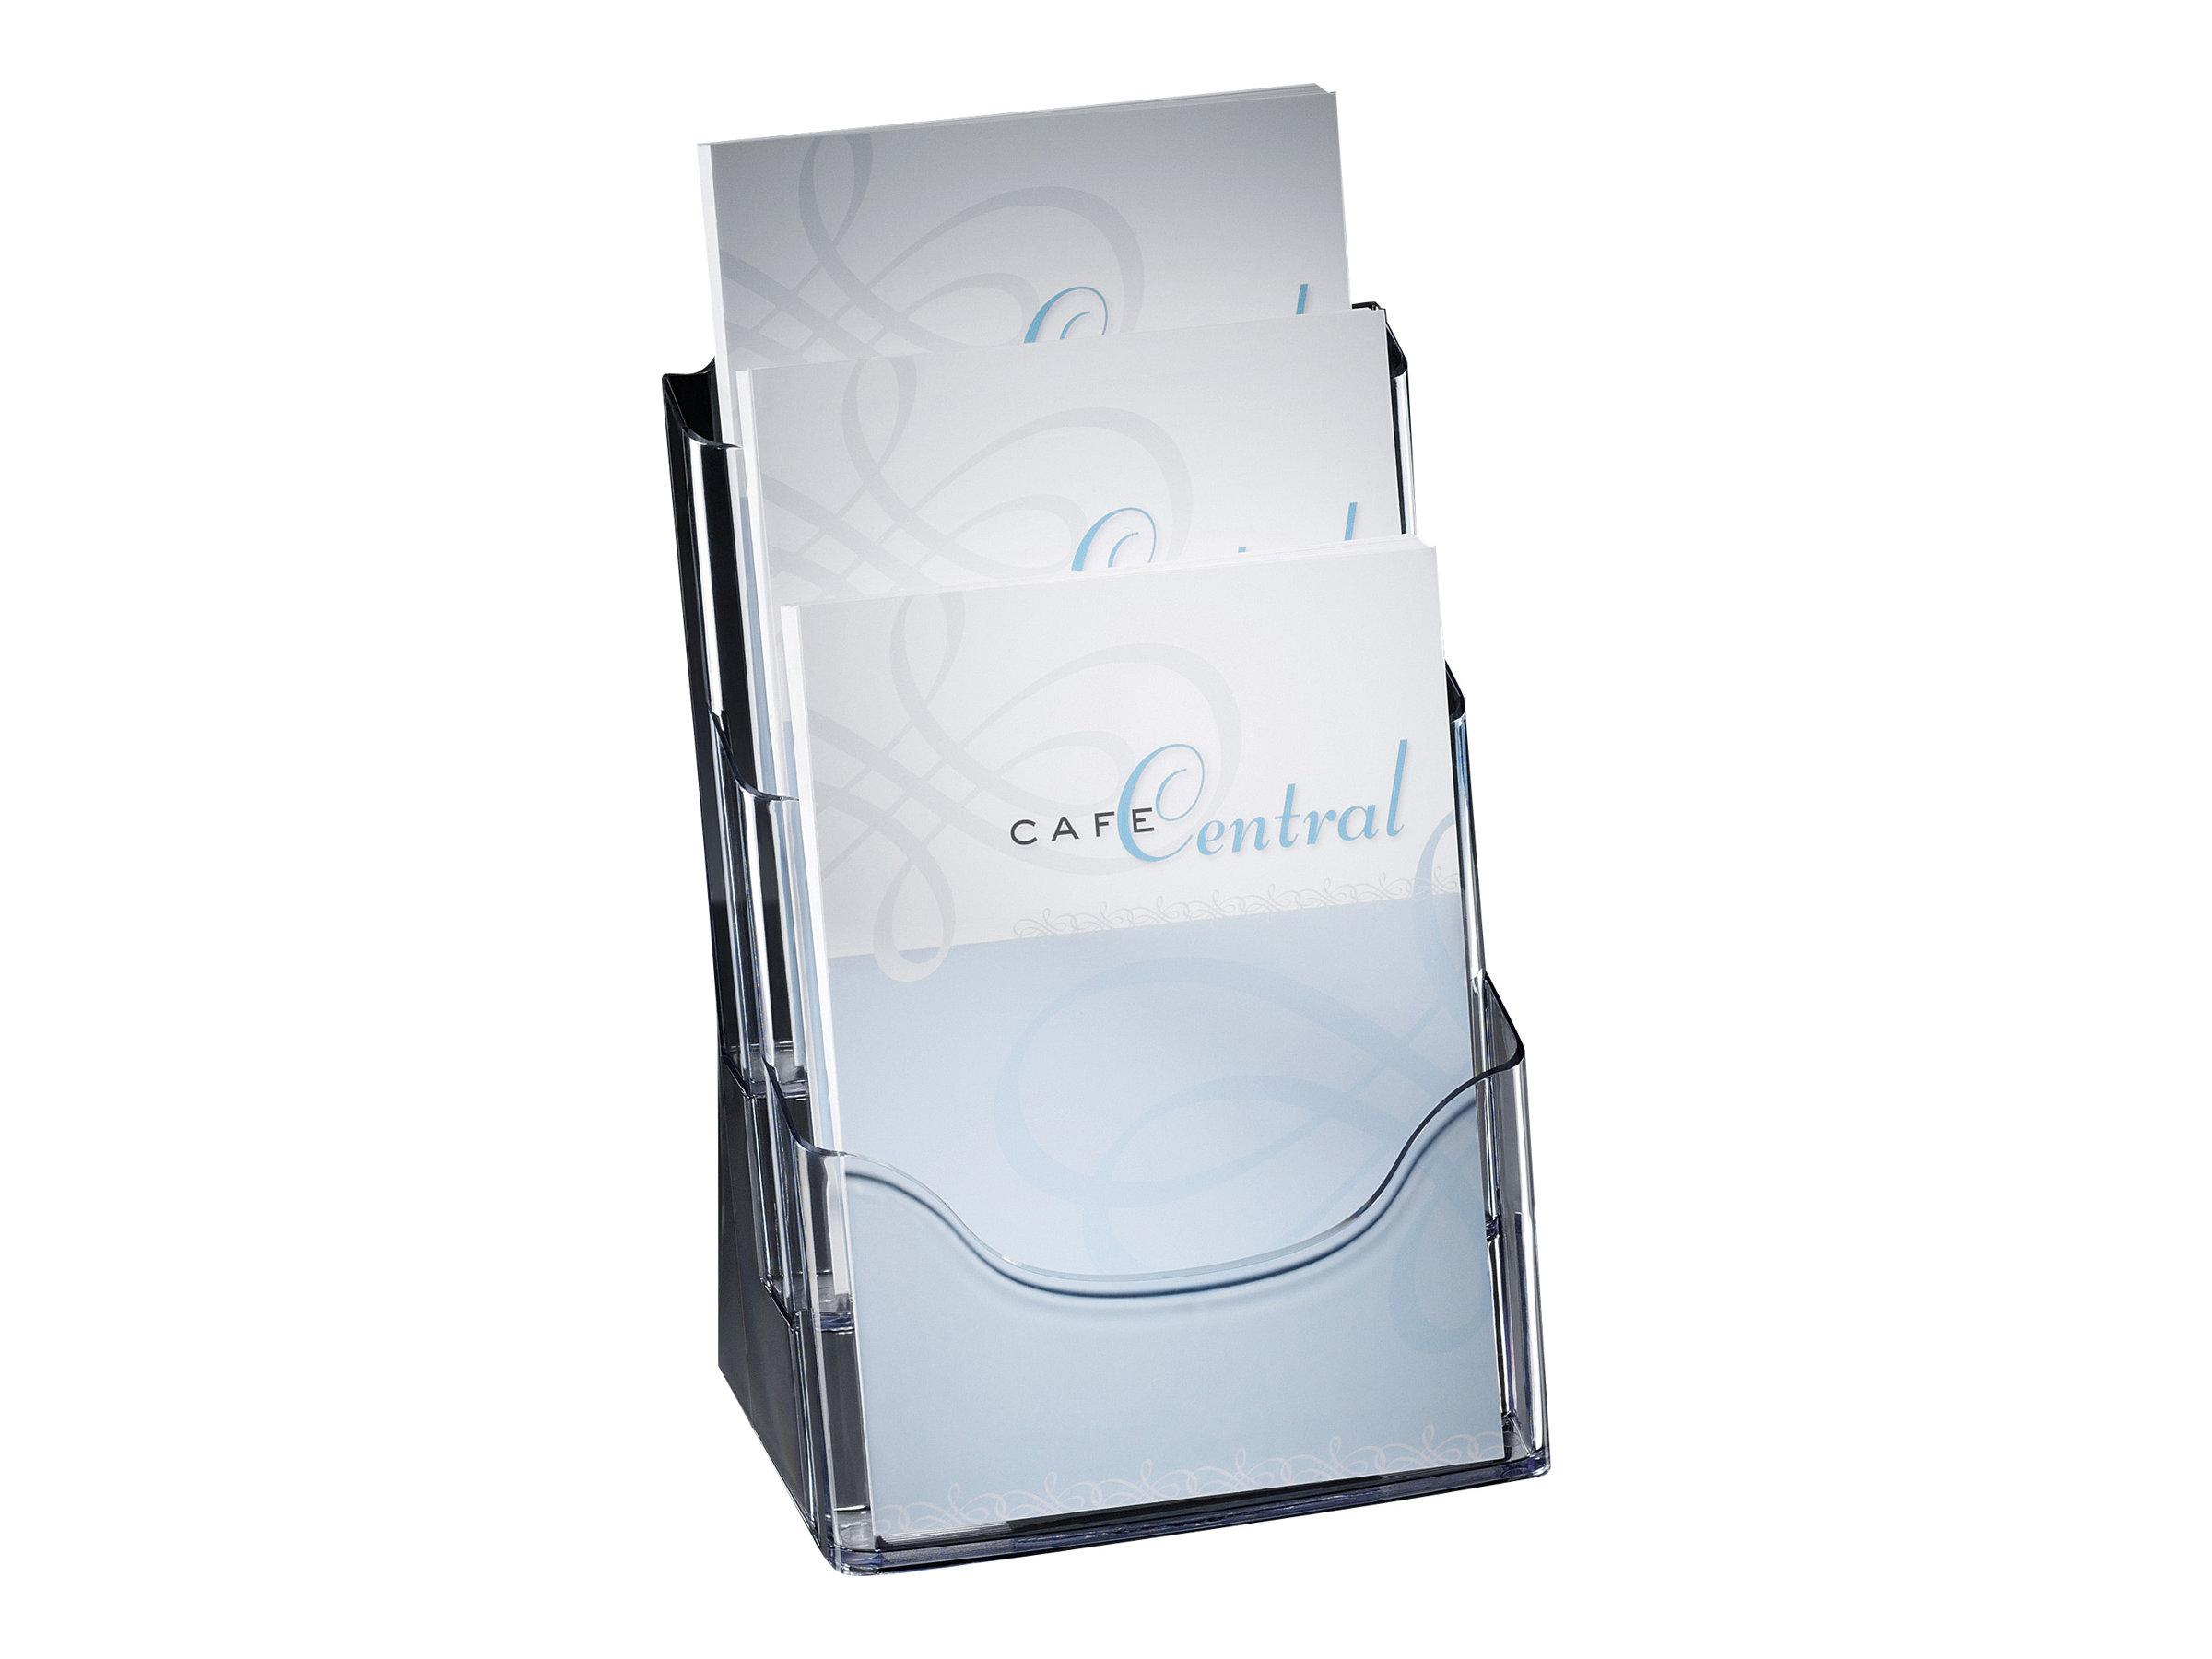 Sigel - Porte-brochures A4 - 3 compartiments